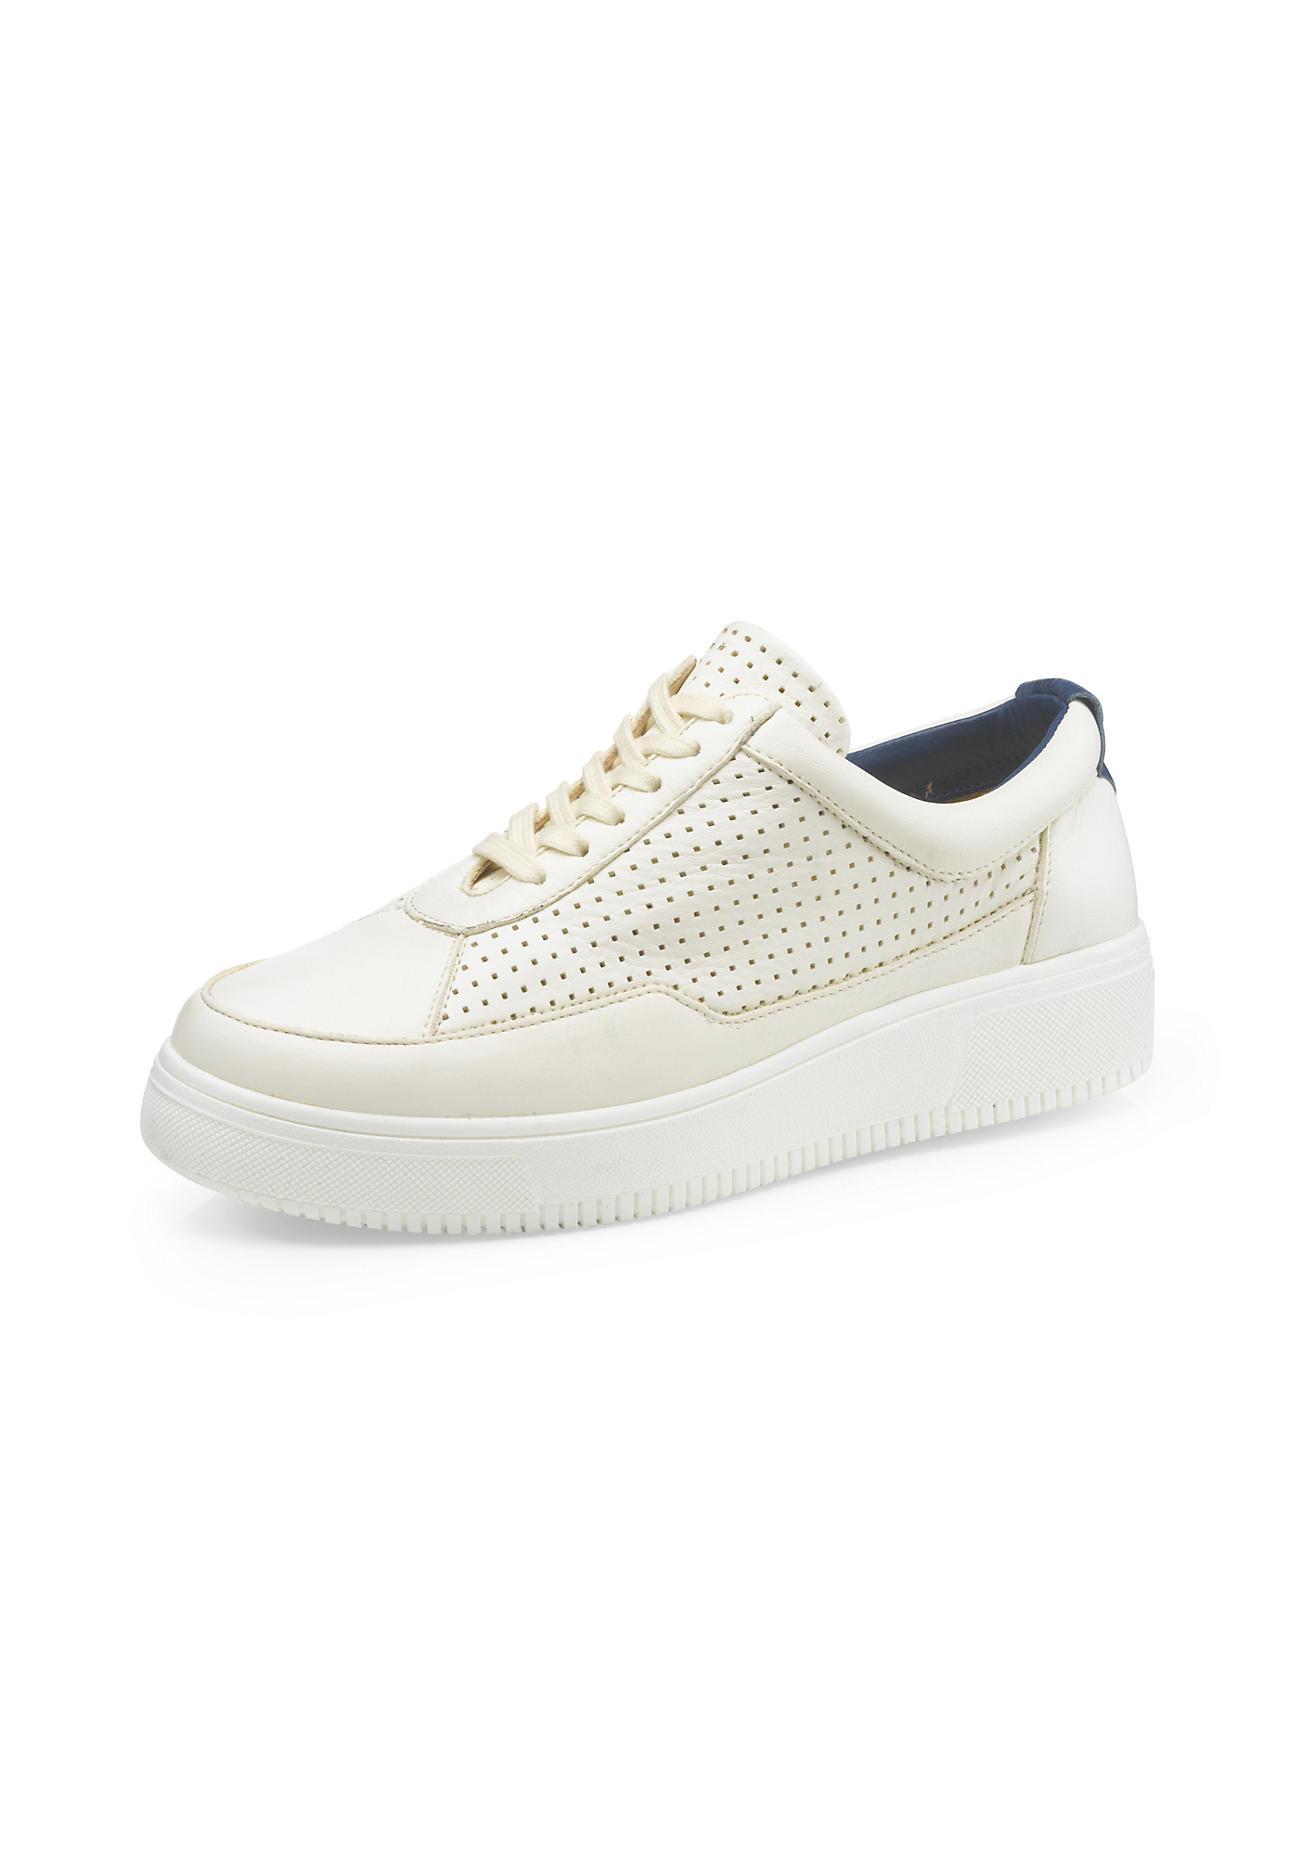 hessnatur Damen Damen Sneaker aus Leder – weiß – Größe 39